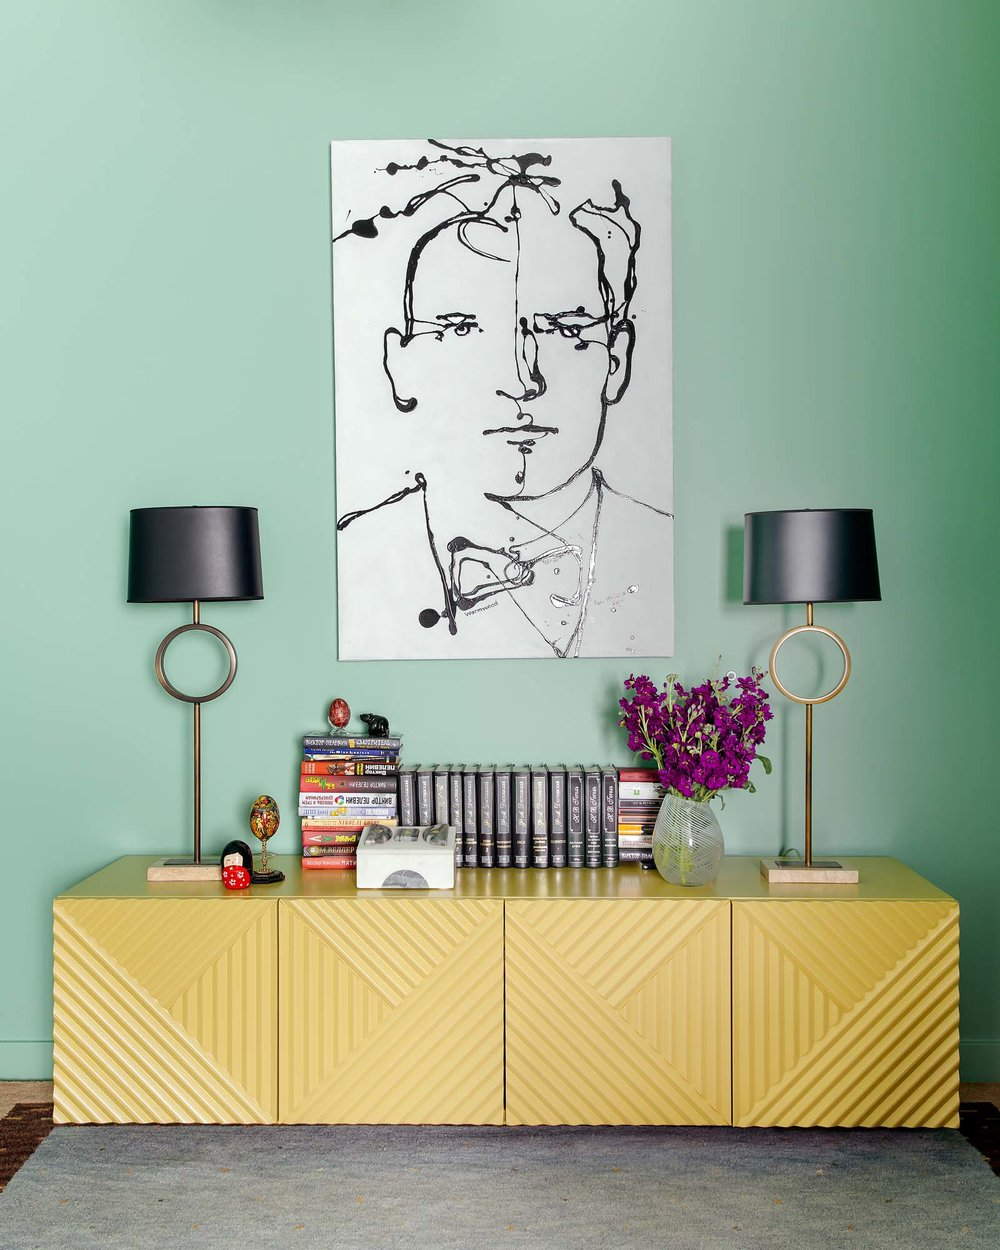 14-Best-Office-Desk-Lamp-Art-Room-Top-Interior-Designers-Boston-Cambridge-Seaport-Dane-Austin-Design.jpg